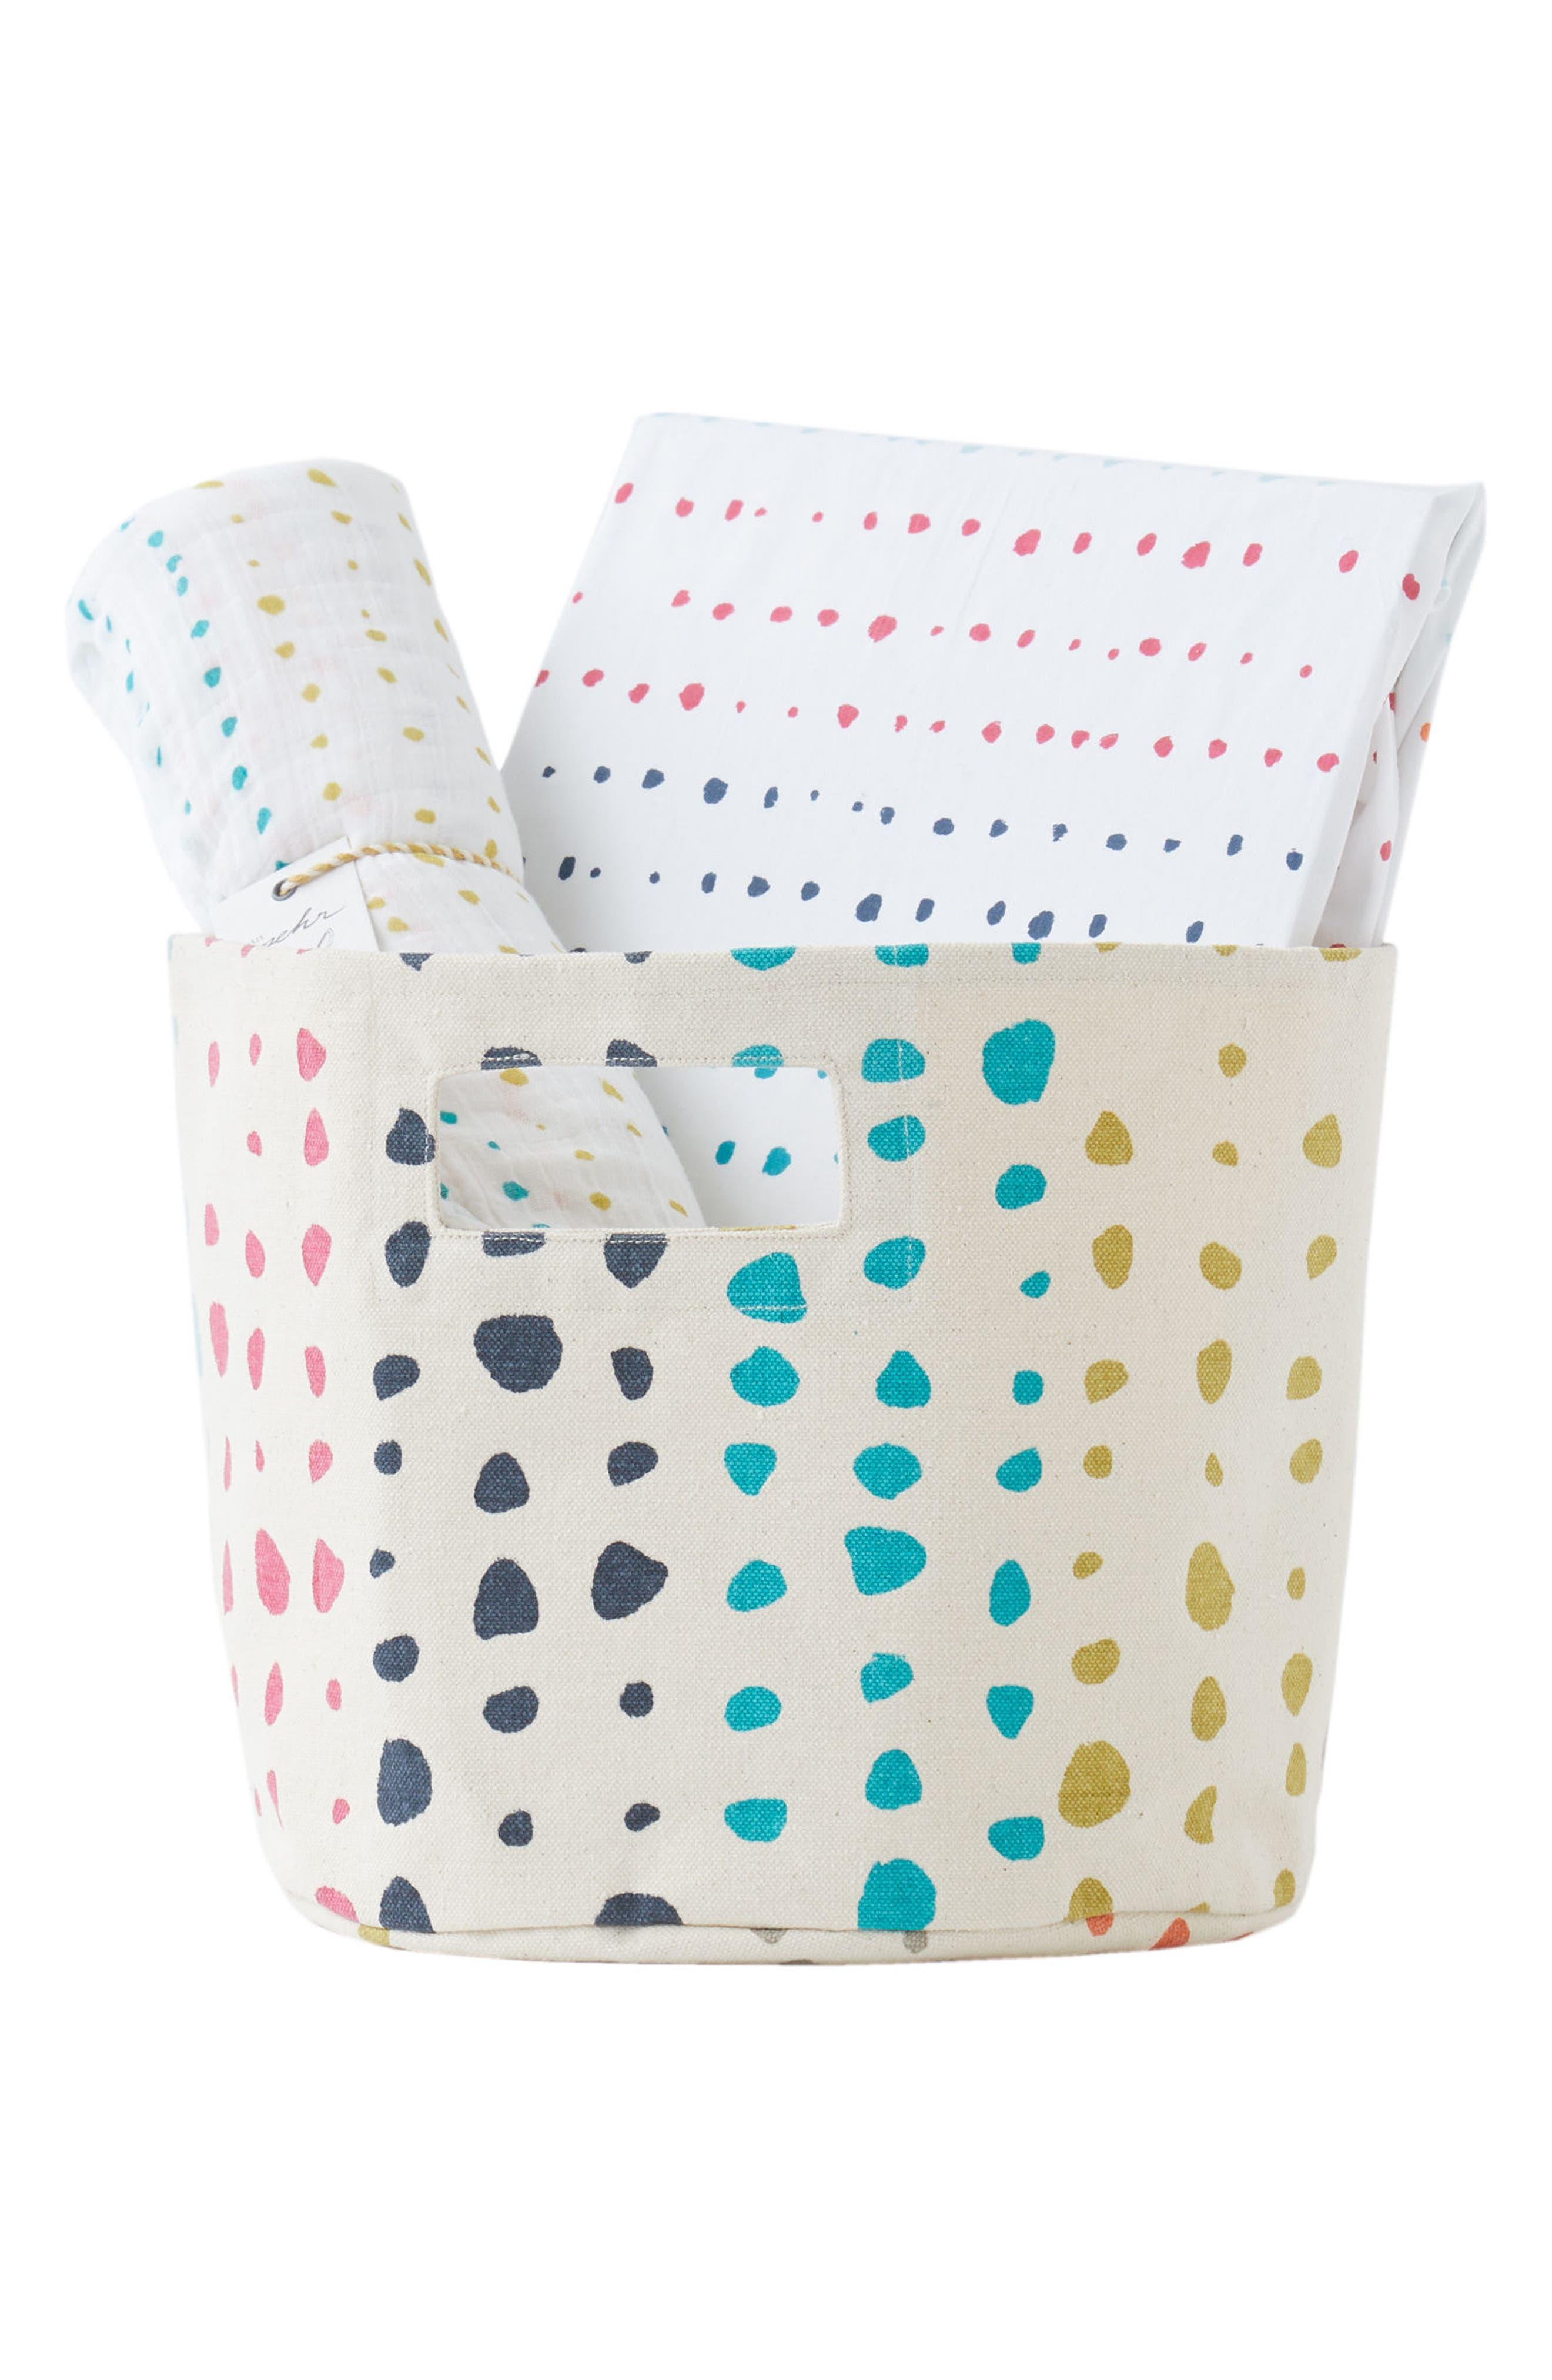 Alternate Image 1 Selected - Petit Pehr Painted Dots Crib Sheet, Swaddle & Bin Set